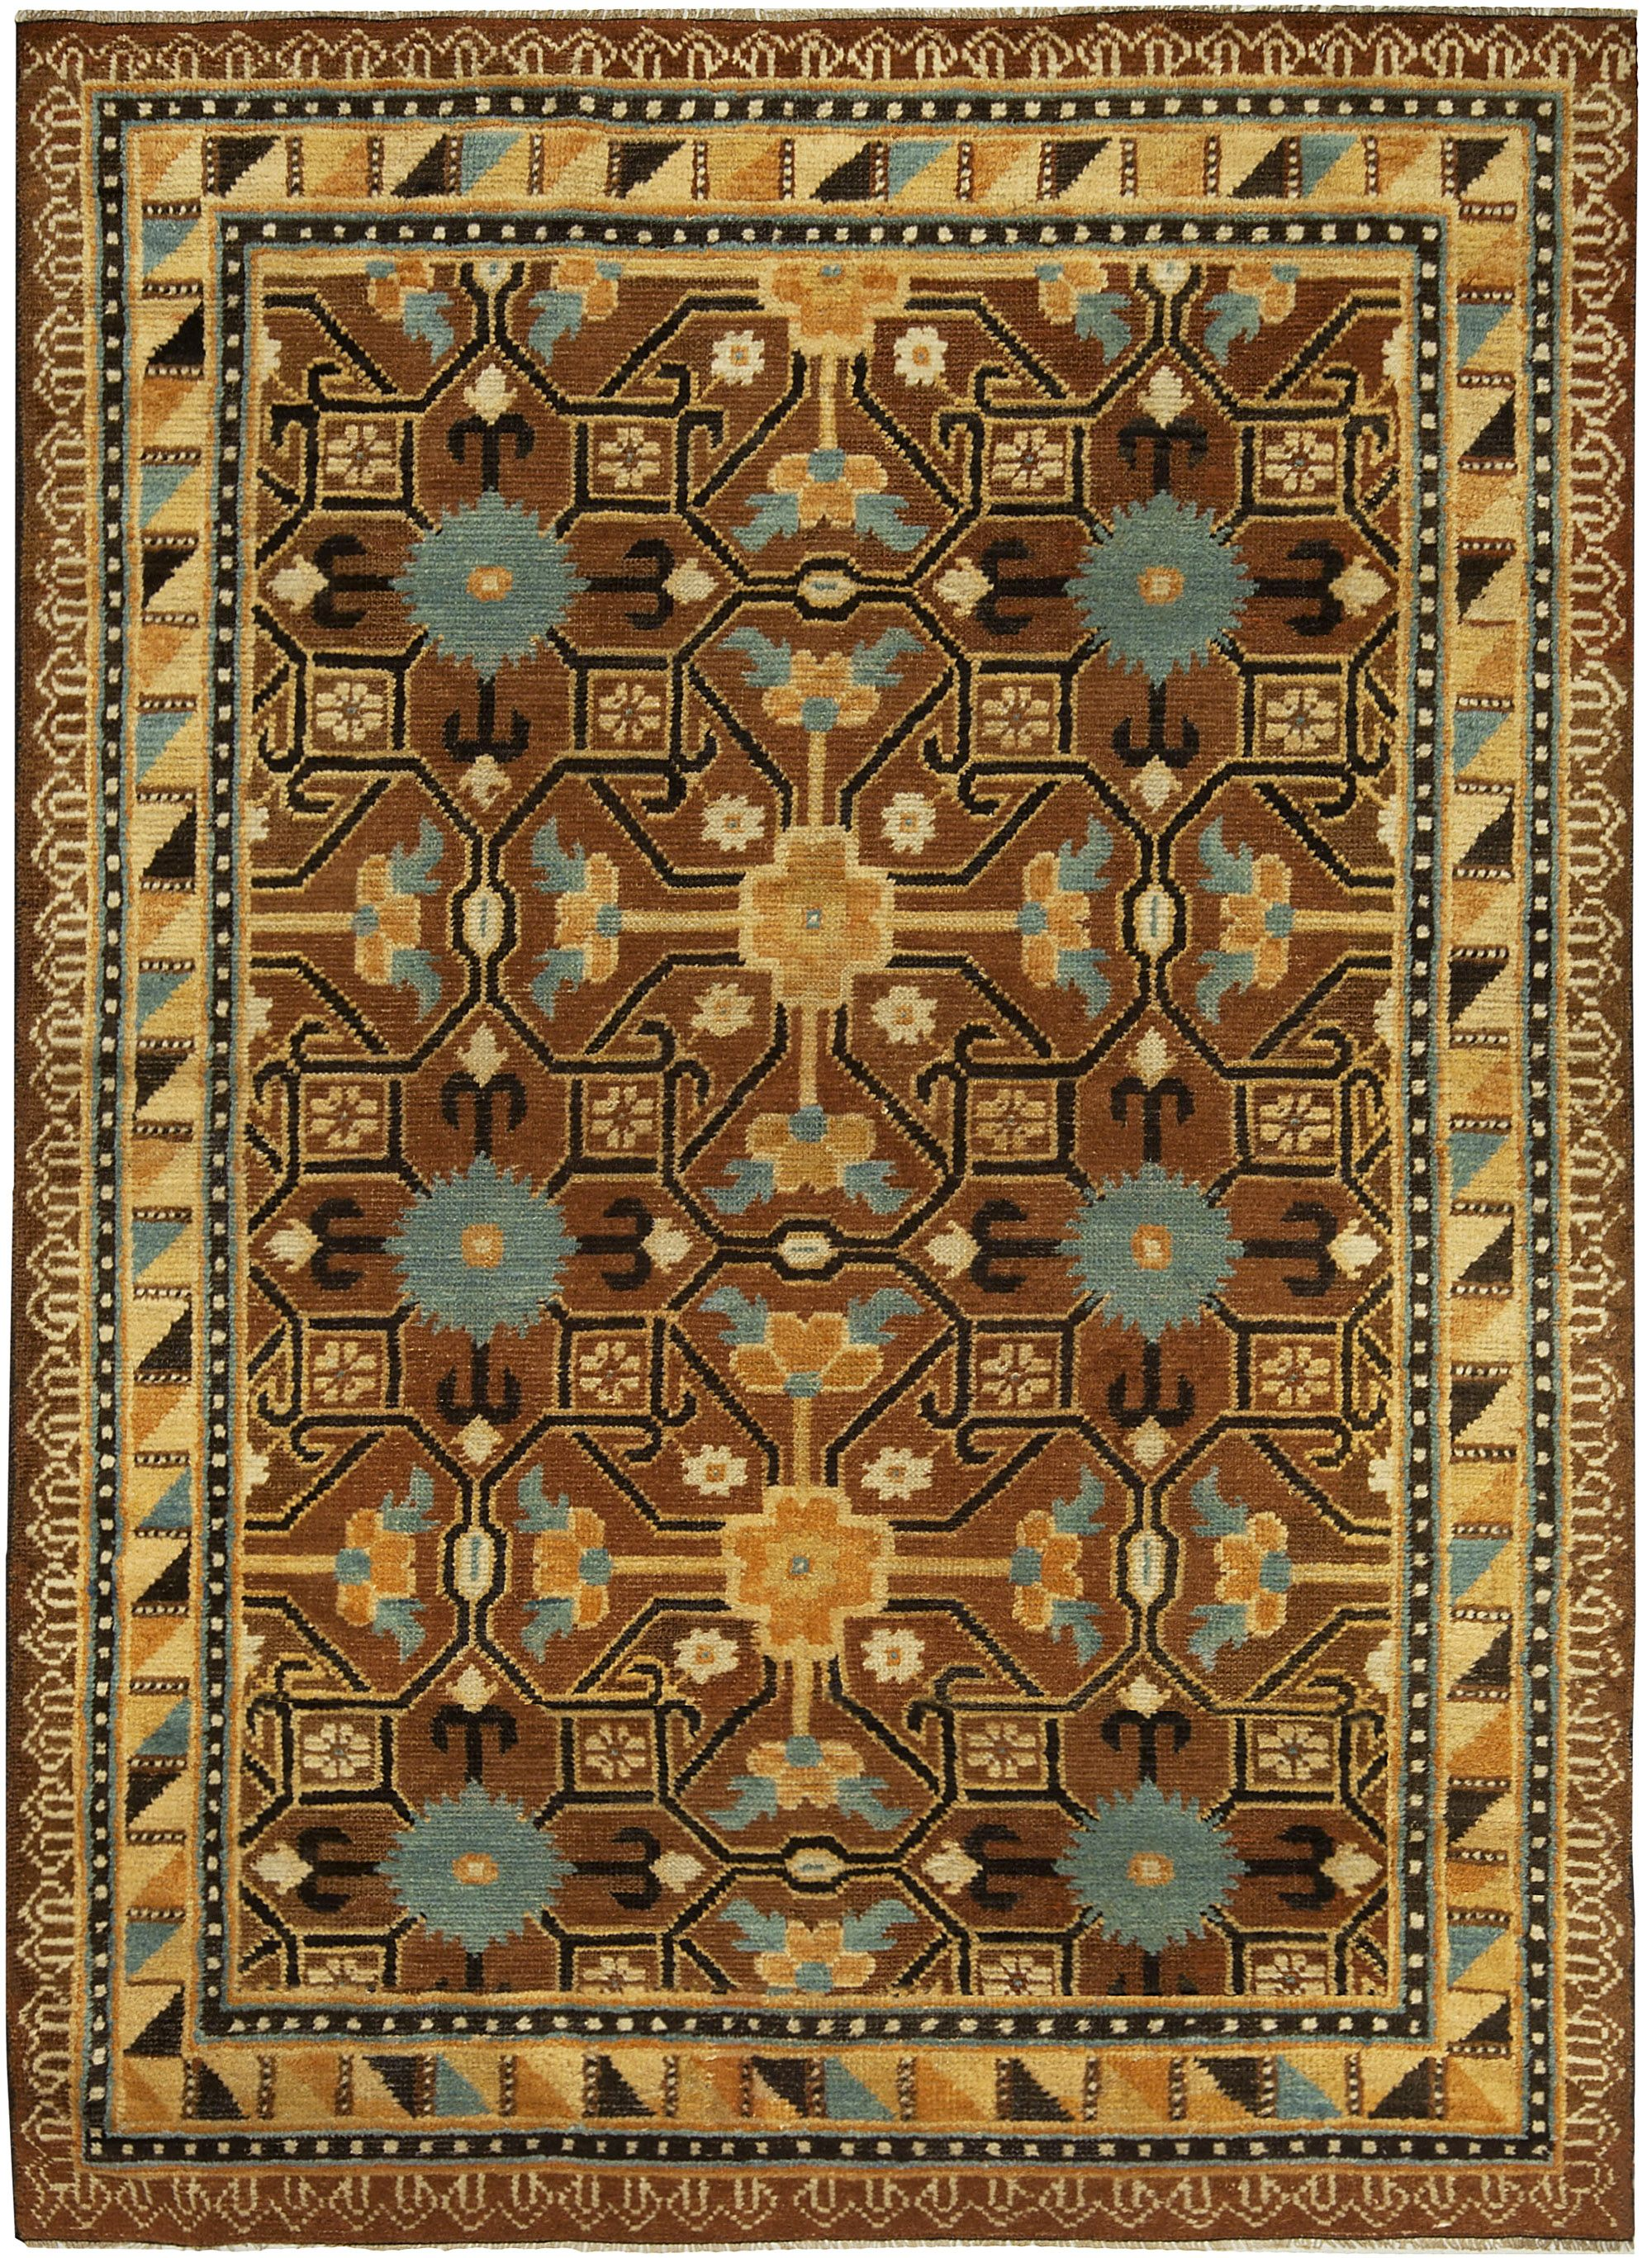 Samarkand Rugs Large Area Carpets For Sale Kilim Wool Rug Nyc Rugs Samarkand Rug Carpet Sale